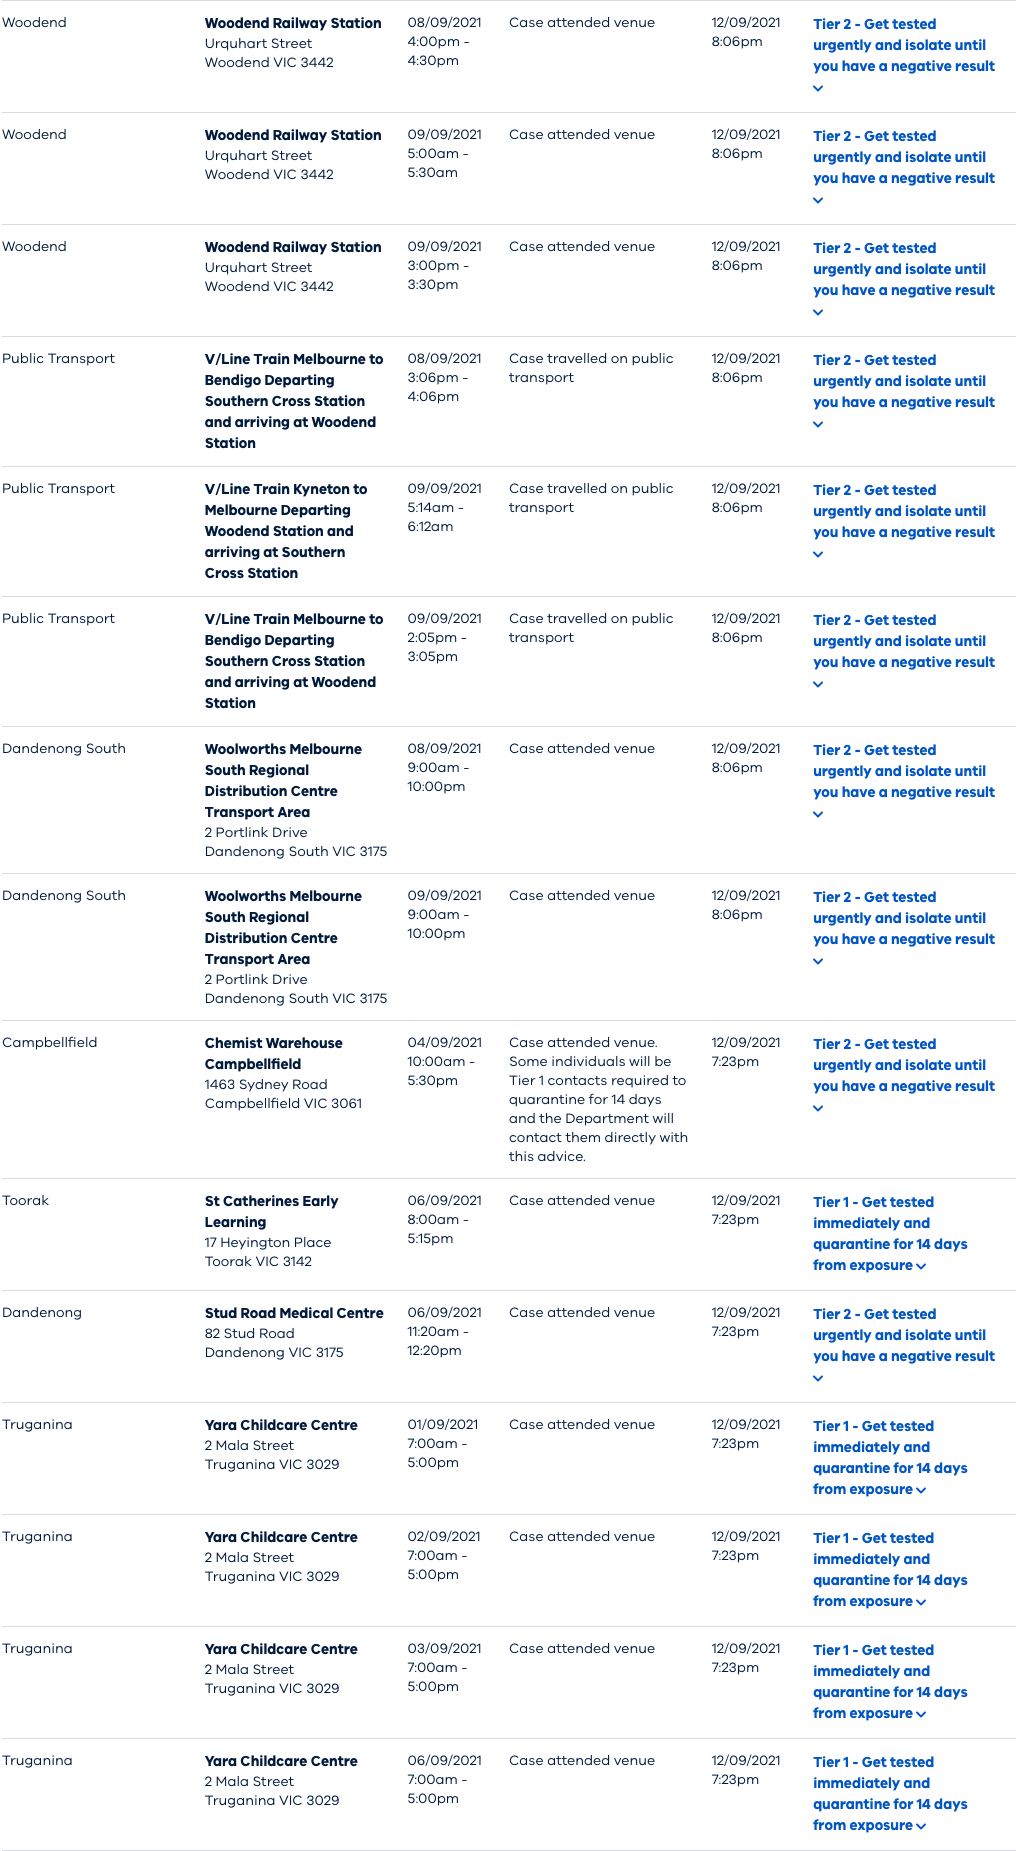 www.coronavirus.vic.gov.au_case-alerts-public-exposure-sites (14).png